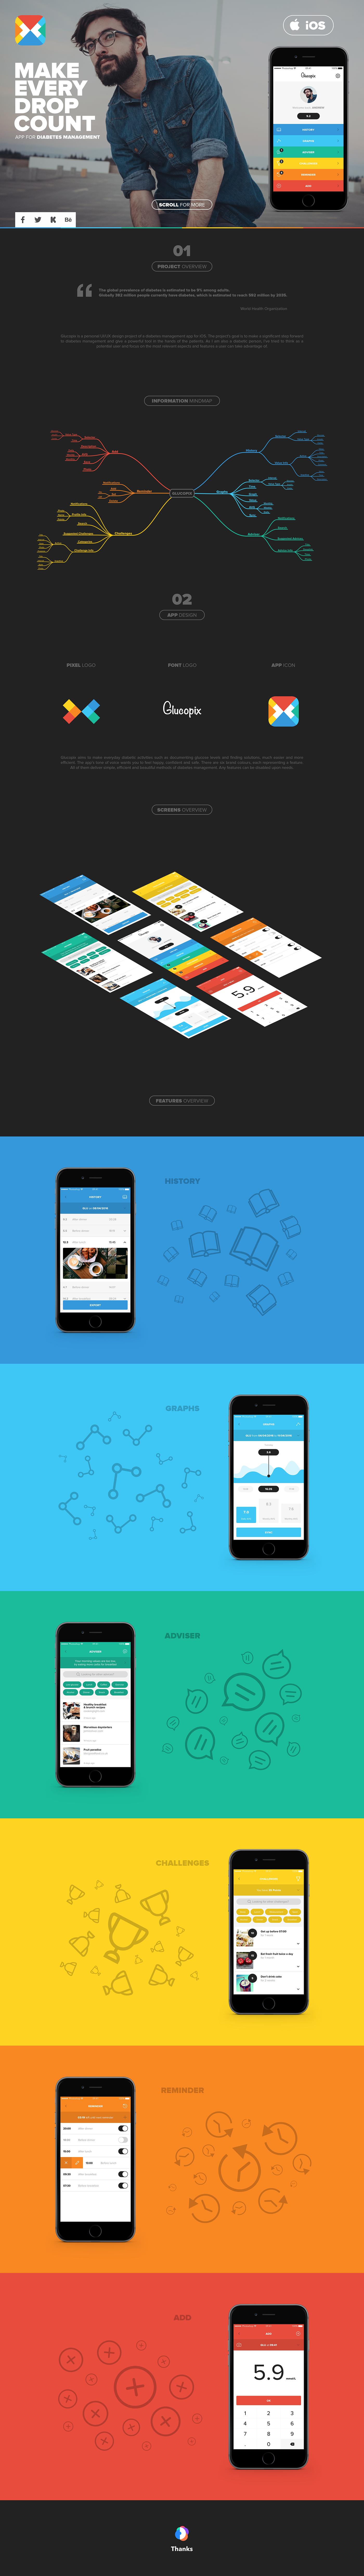 app ios apple iphone Health healthcare diabetes tracking flat color app design Application Design glucose